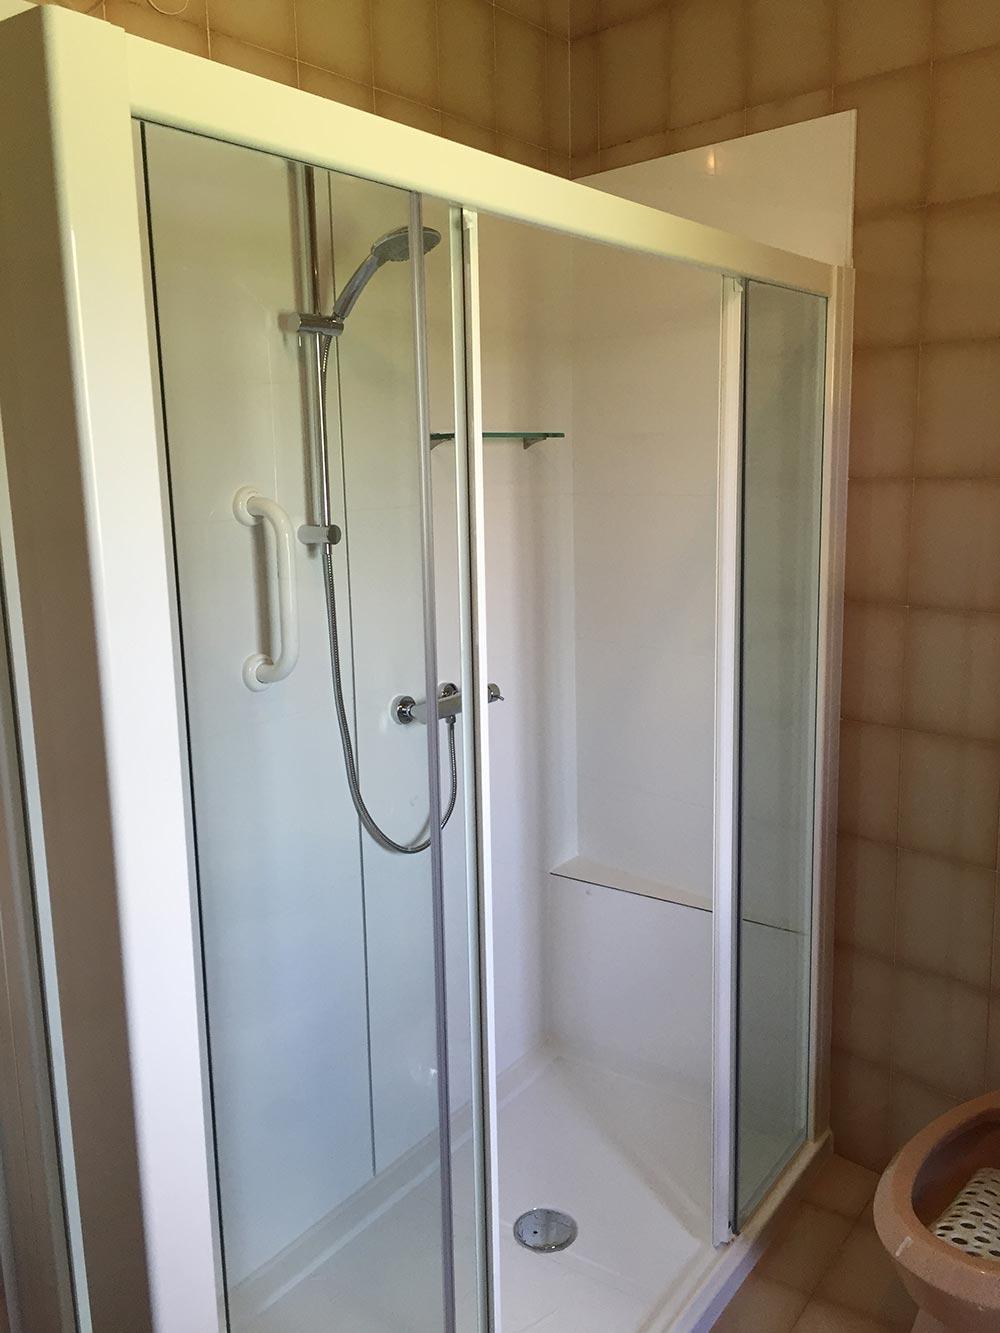 Veneta vasche forniture ed installazione vasche da bagno - Vasca da bagno 100x70 ...